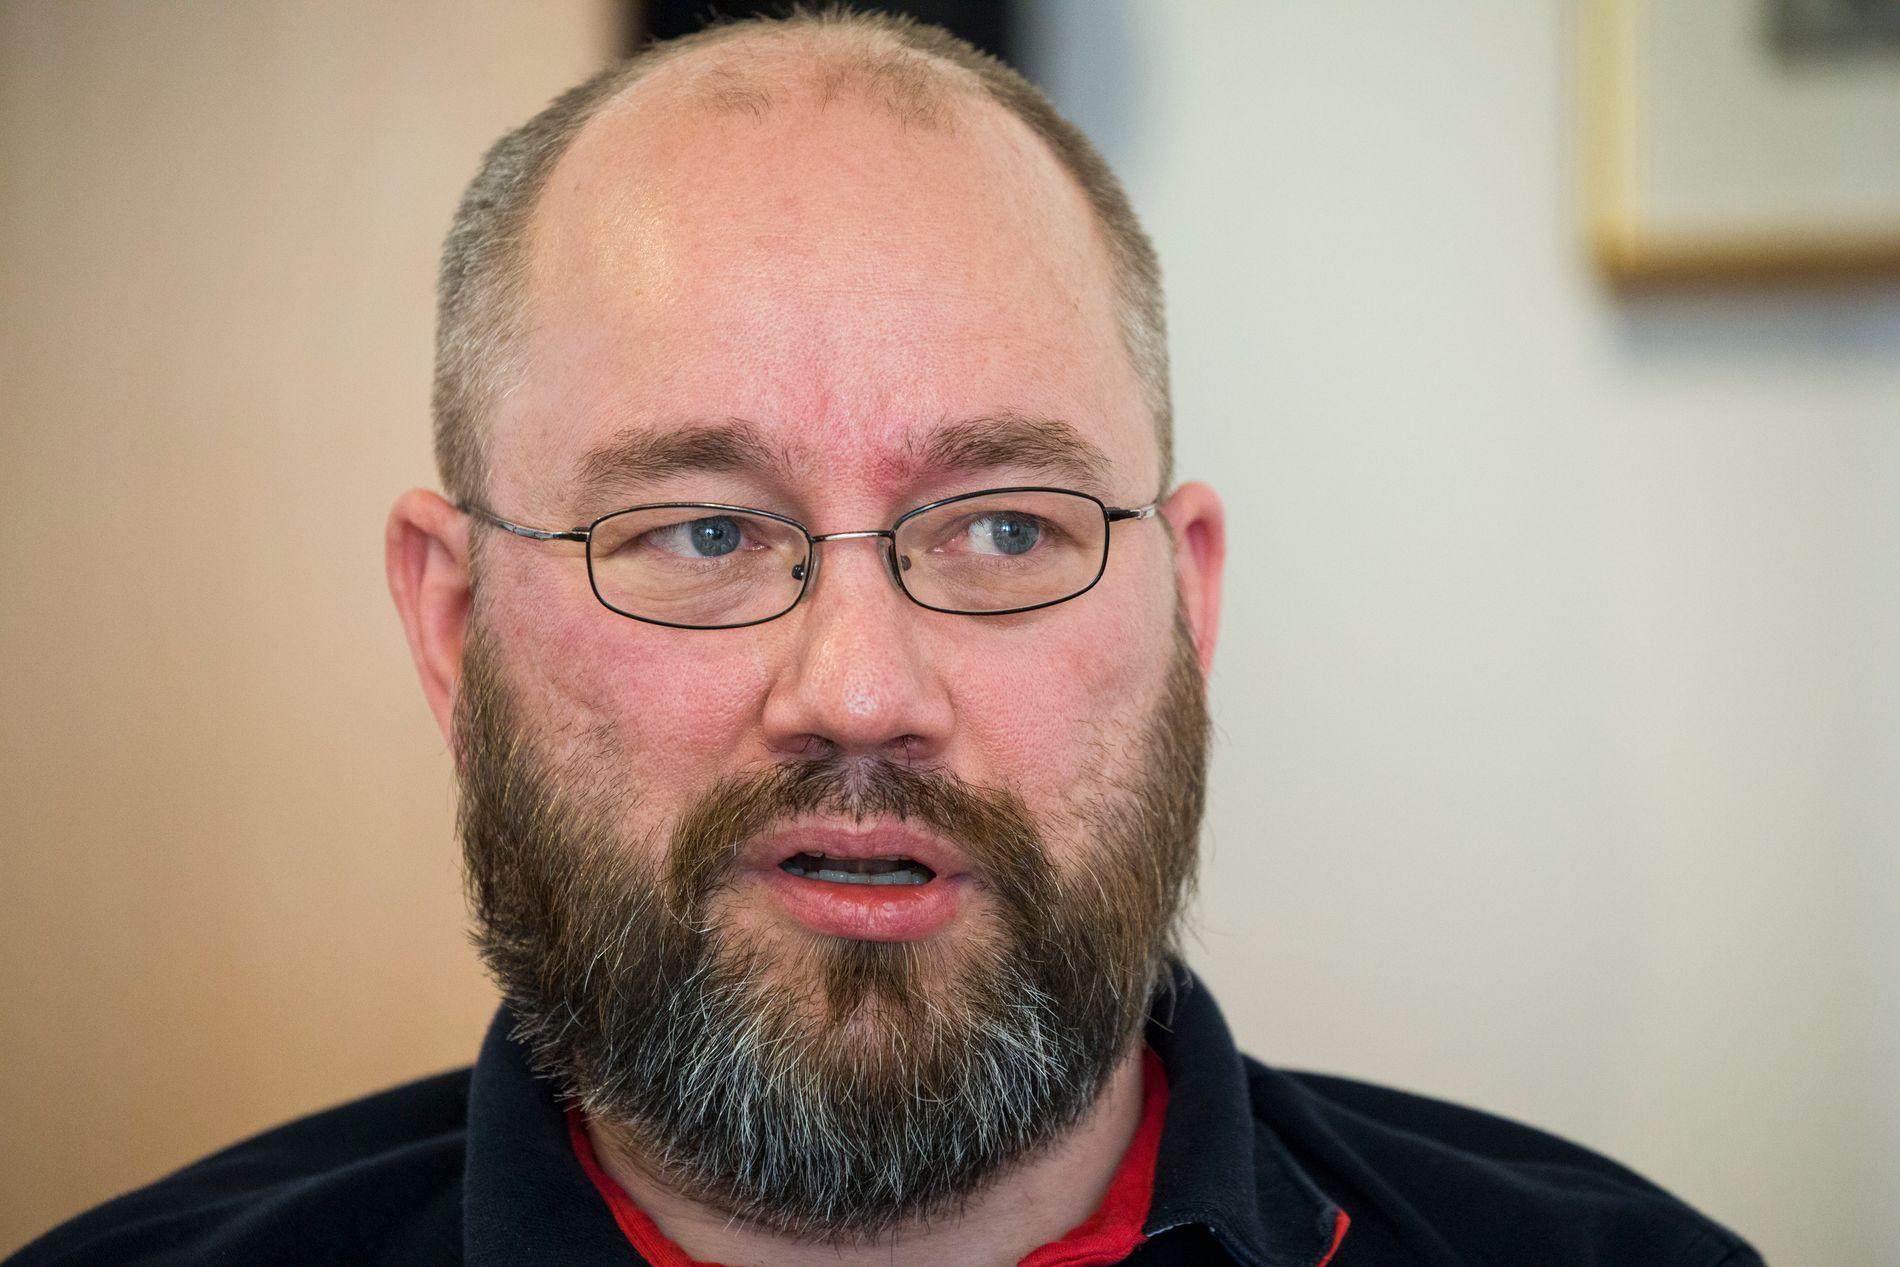 REAGER: Torbjørn Bongo is the federal leader in the Norwegian office association.